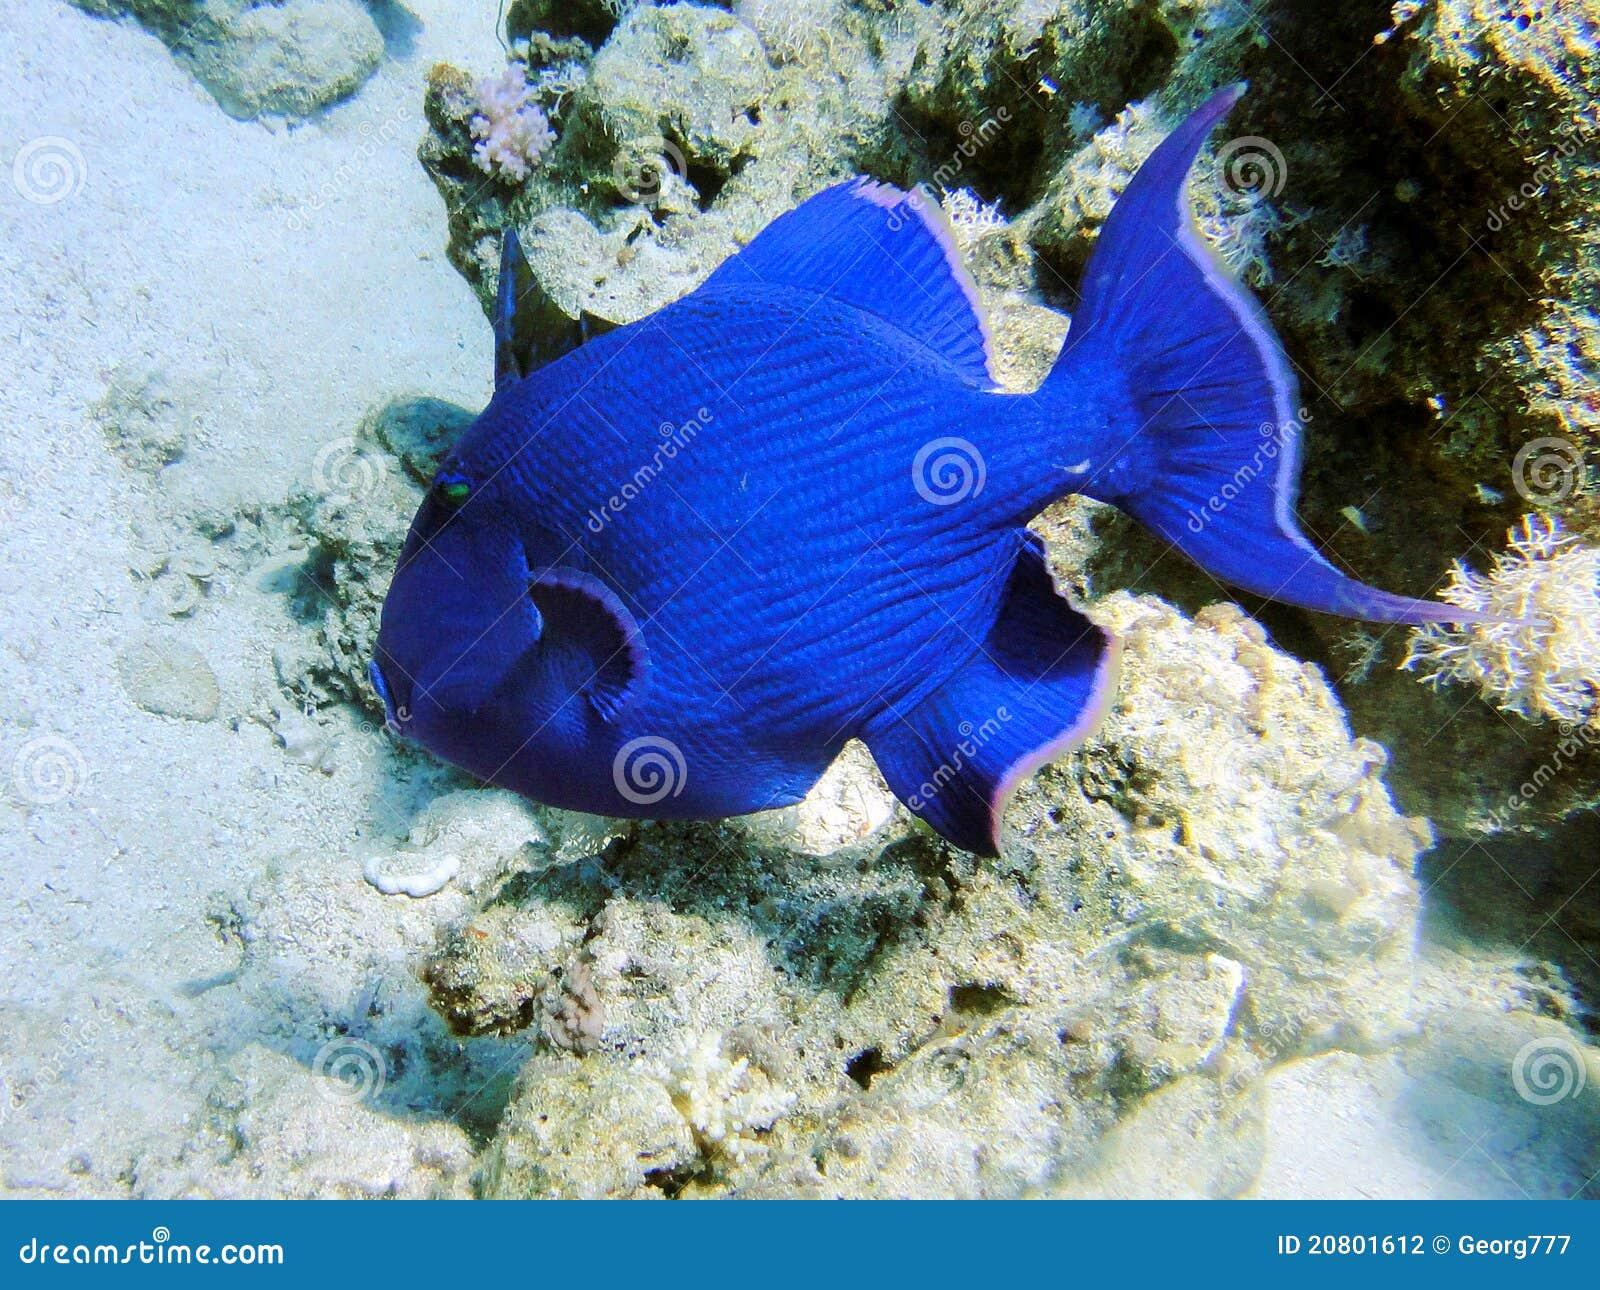 Big Blue Fish 1 Stock Photography Image 20801612